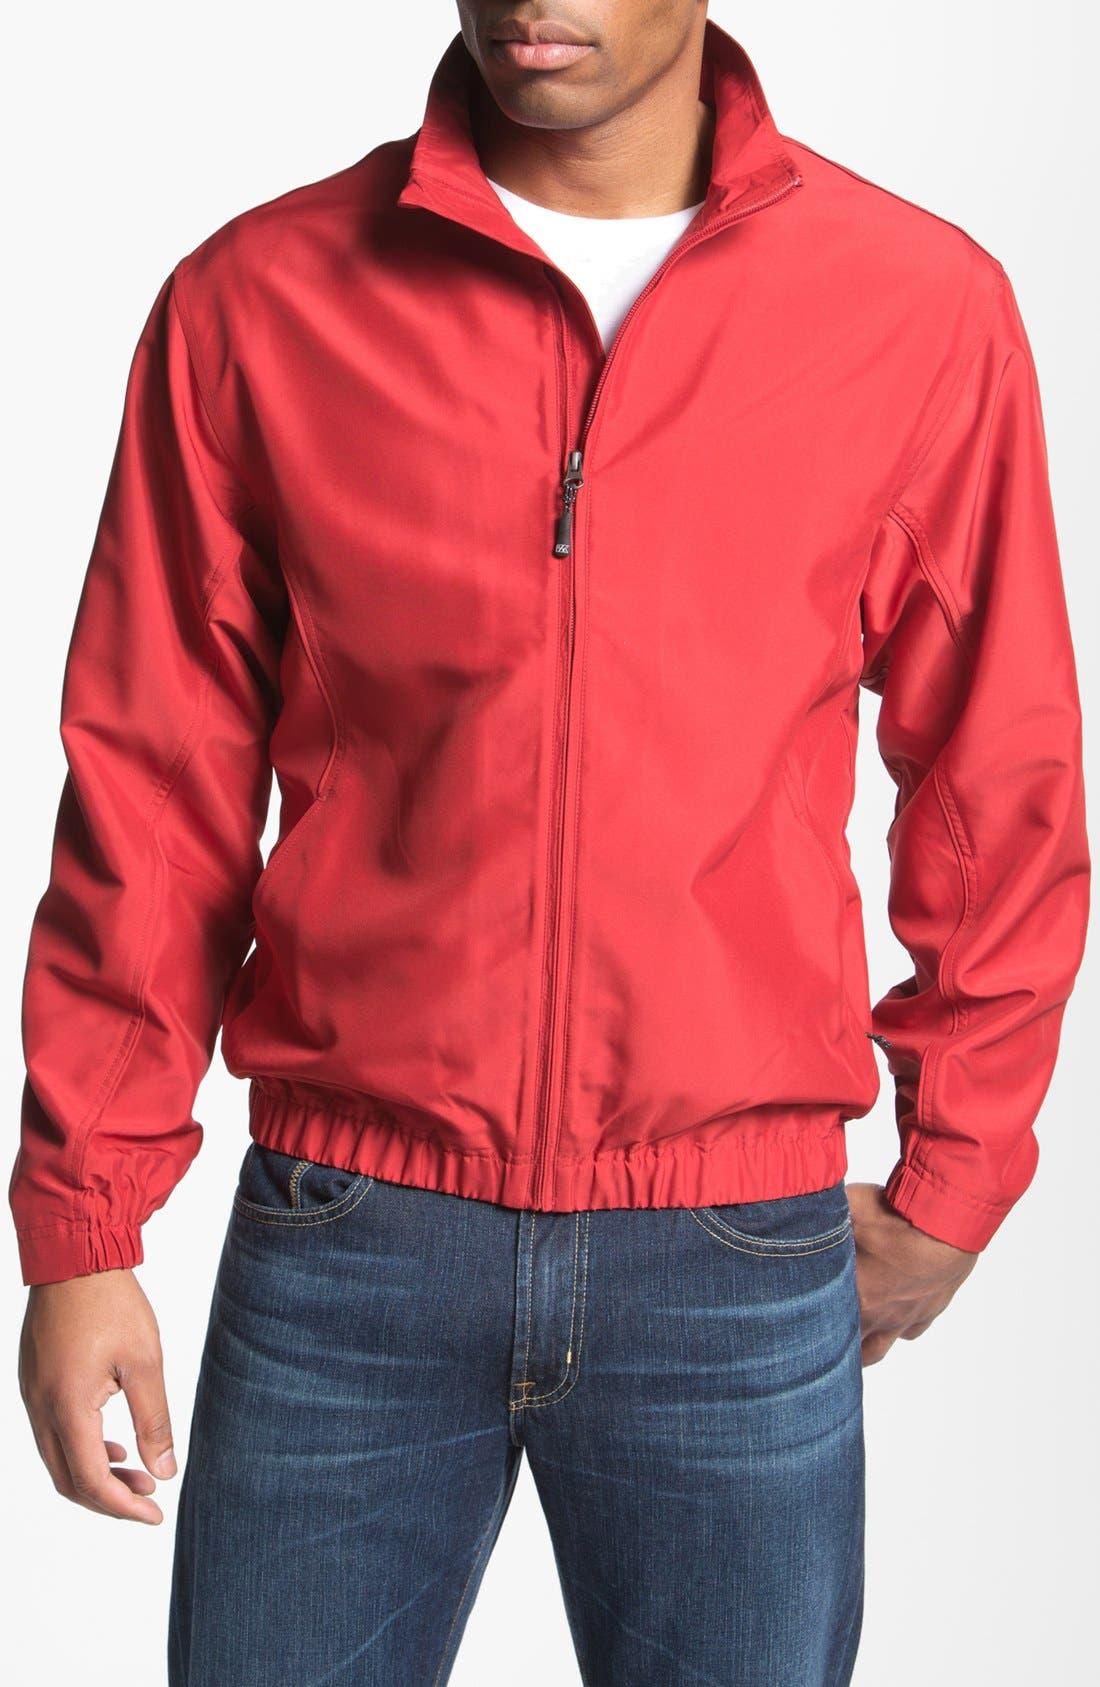 Alternate Image 1 Selected - Cutter & Buck 'Astute' Windbreaker Jacket (Big & Tall)